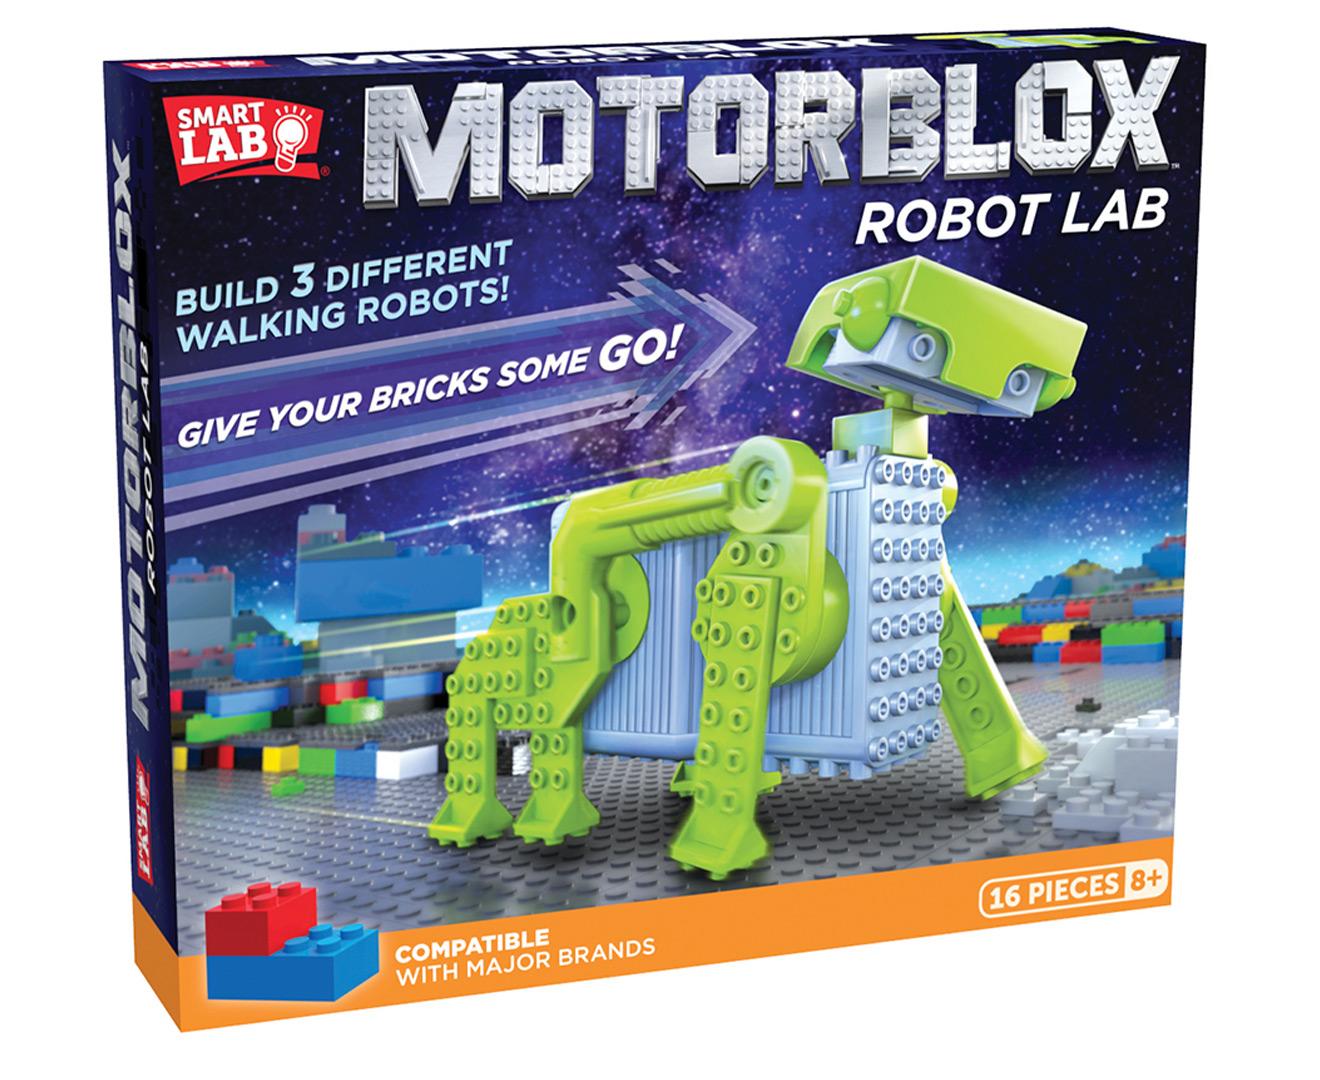 Smartlab Motorblox Robot Lab Toy Catch Com Au